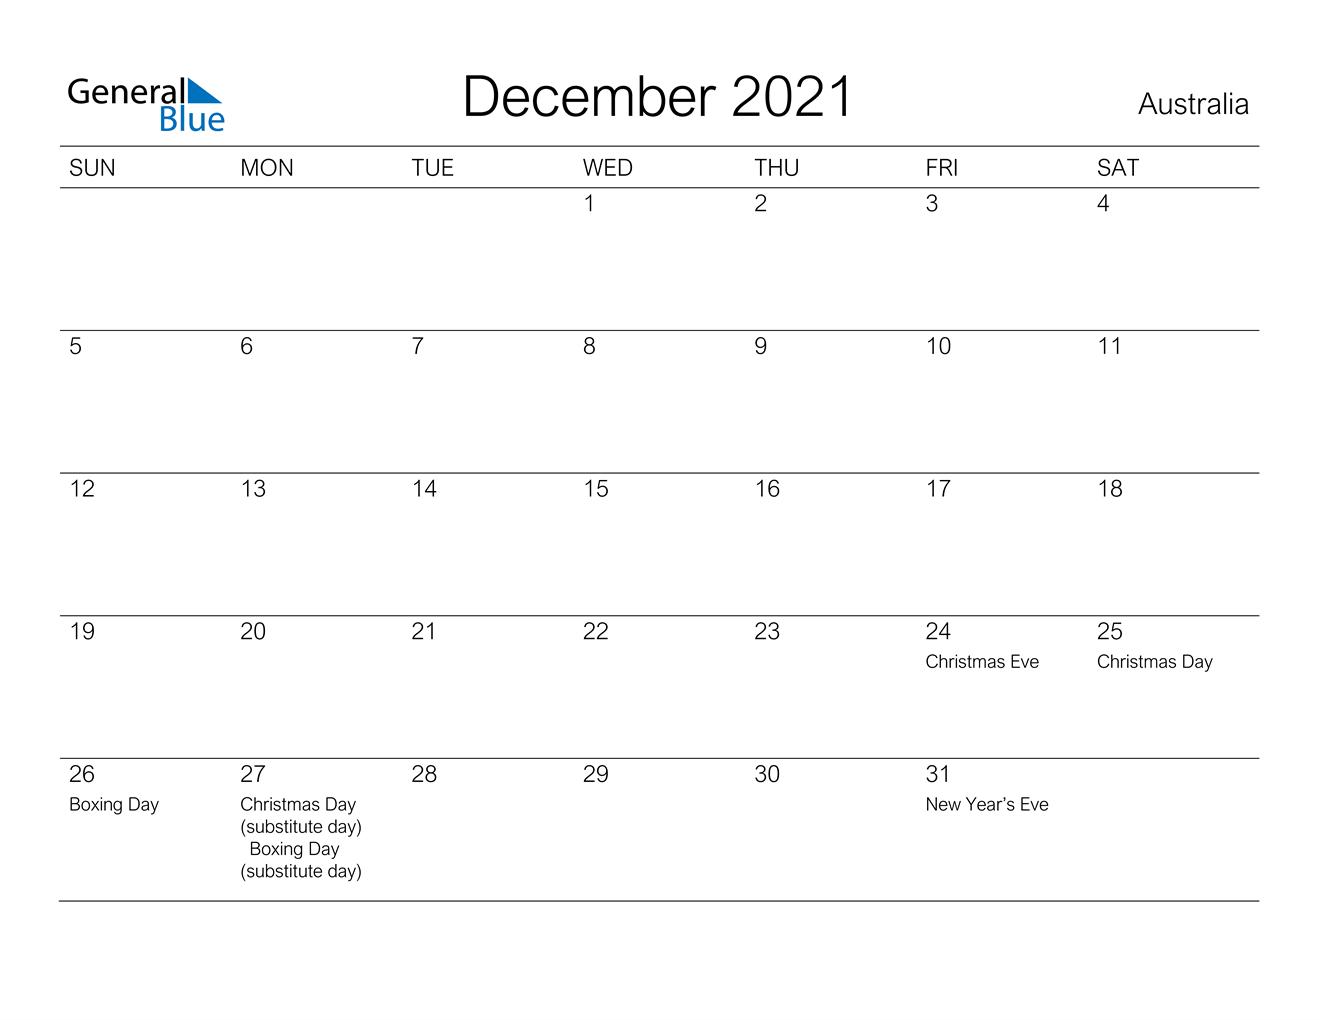 December 2021 Calendar - Australia